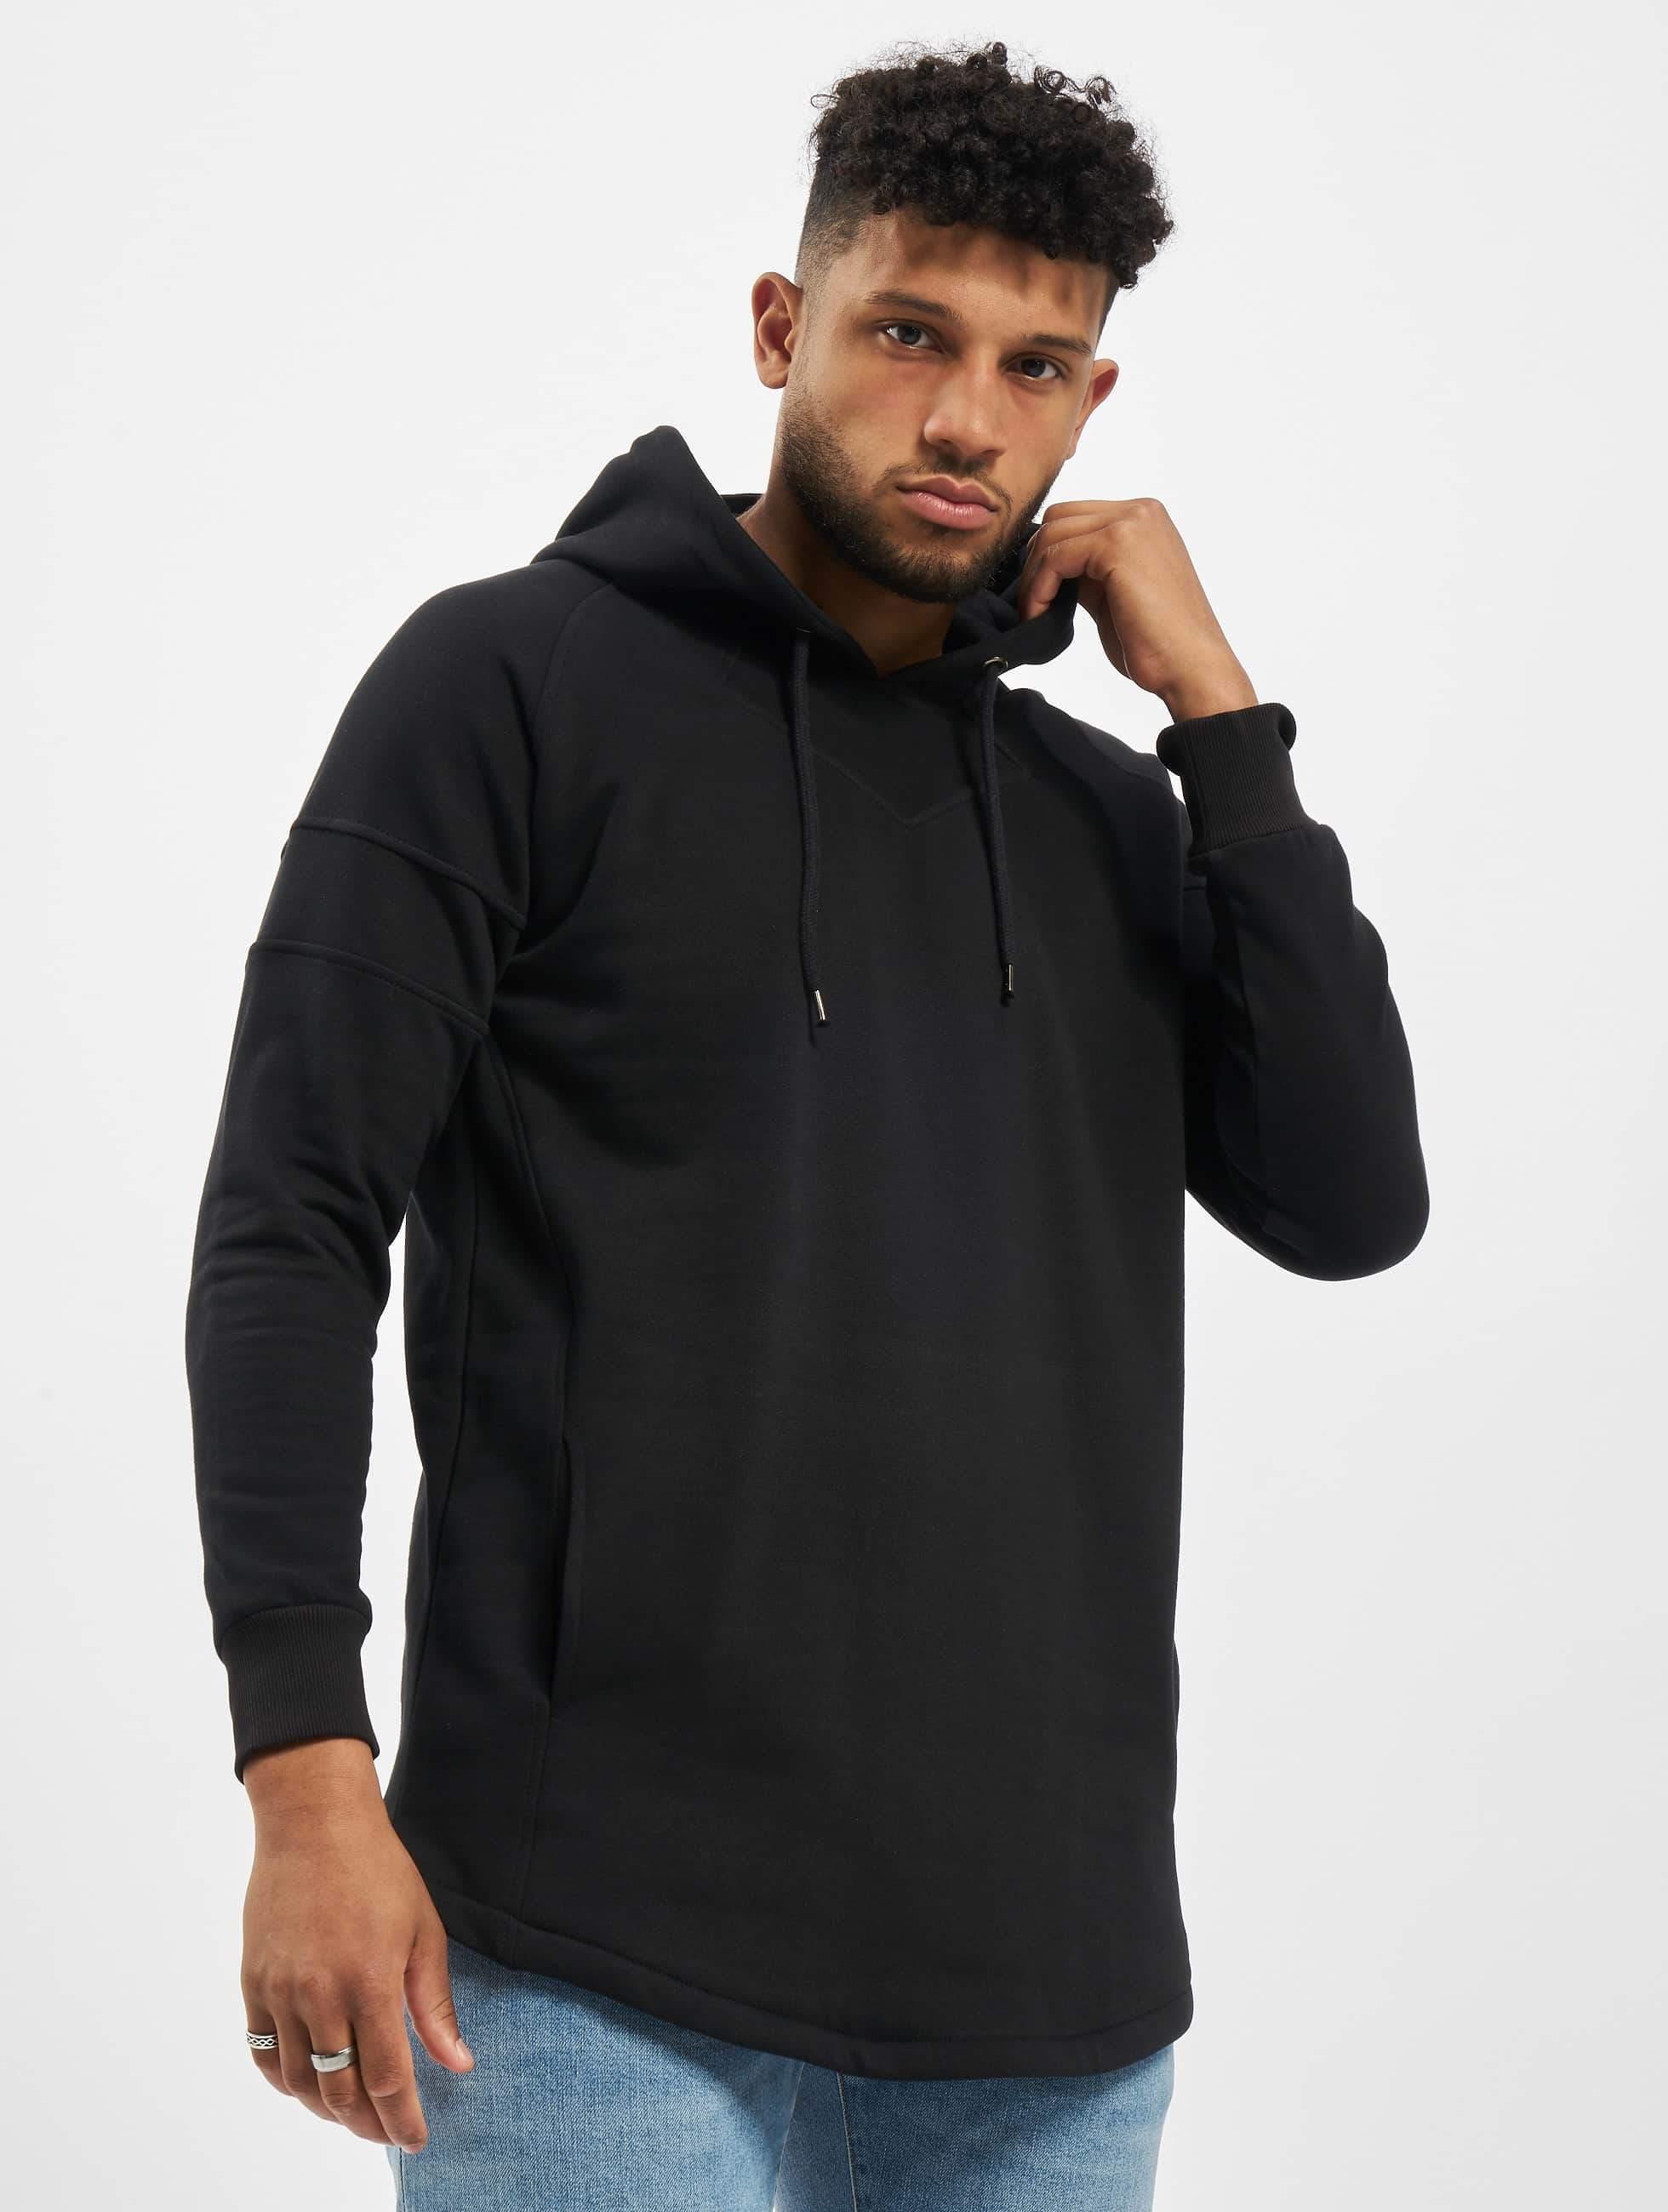 Urban Classics Long Shaped Hoody Black